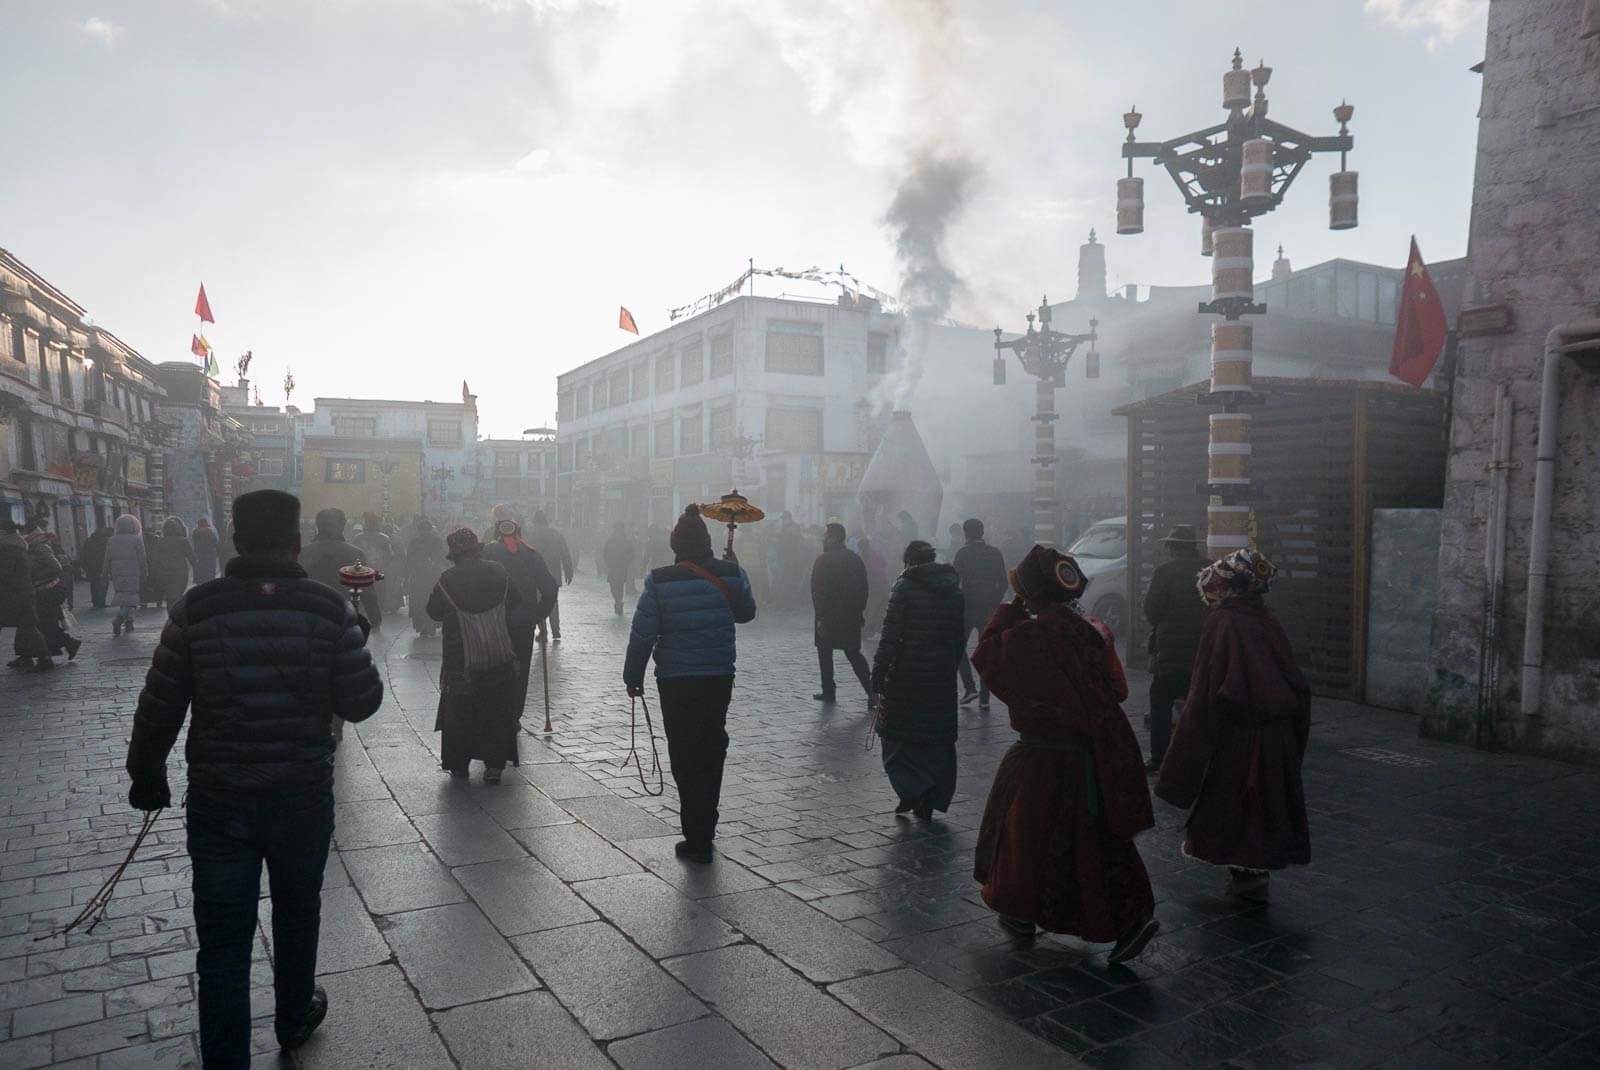 tibet-lo-res-1100622